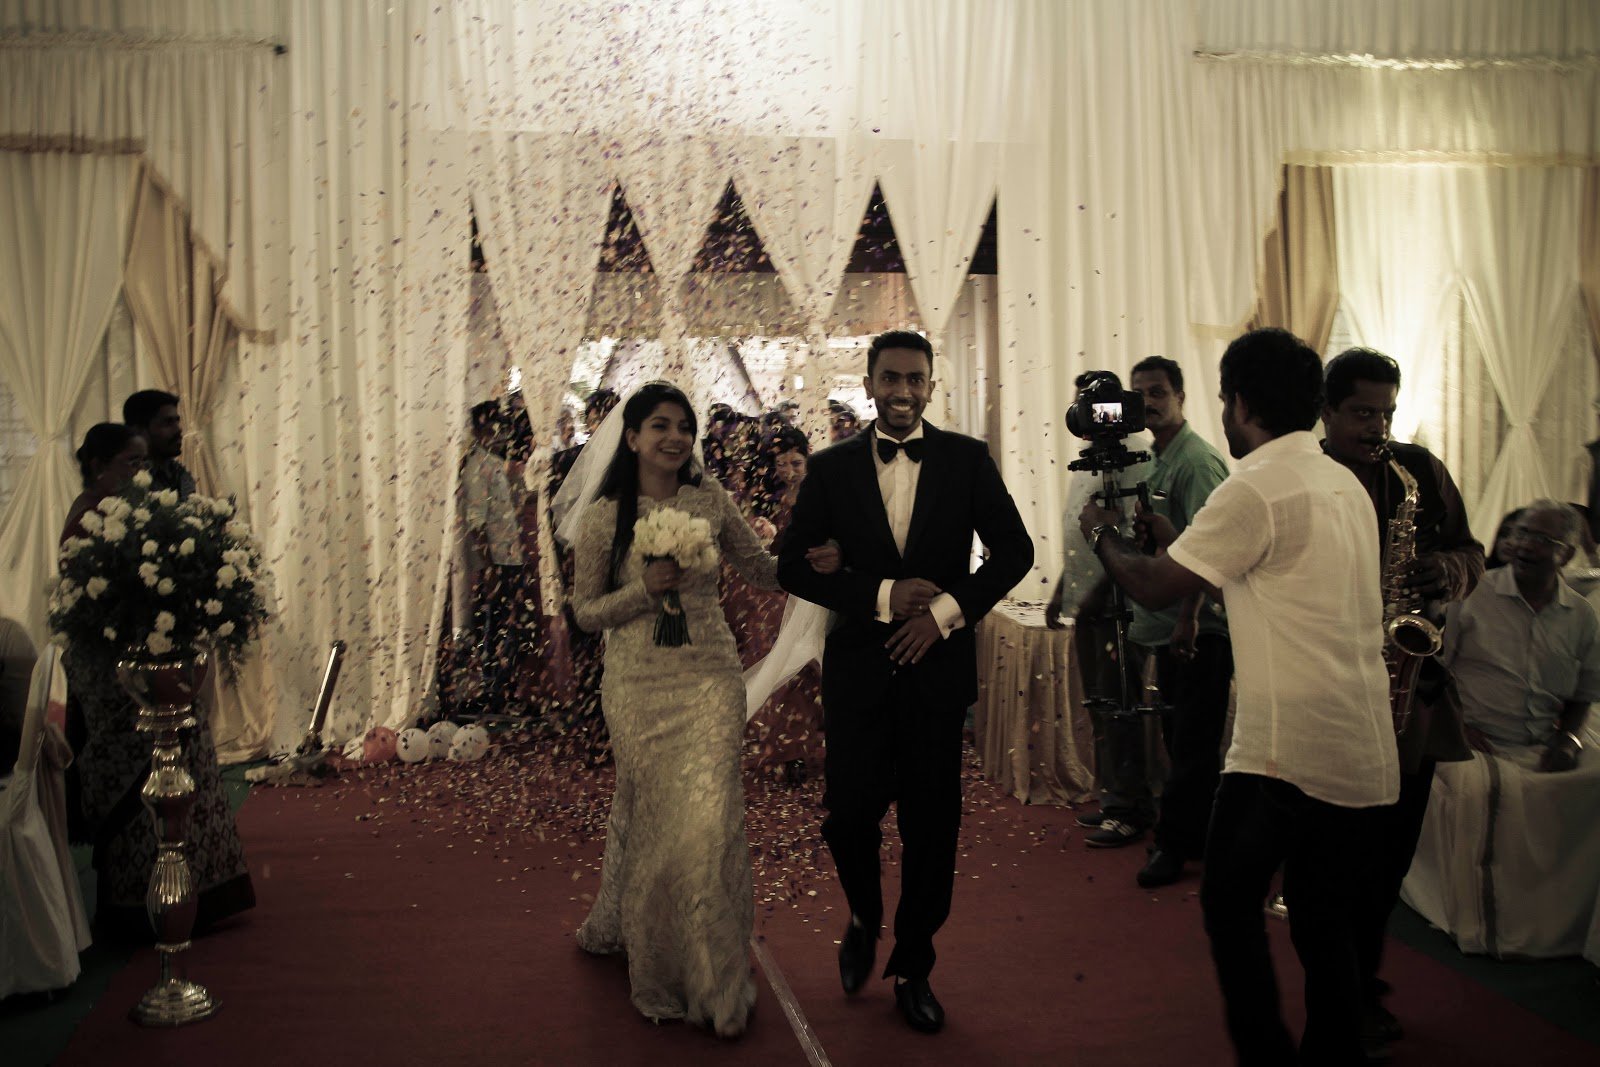 wedding planner pathanamthitta +p,  wedding planner pathanamthitta +q,  wedding planner pathanamthitta + r,  wedding planner pathanamthitta + s,  wedding planner pathanamthitta + t